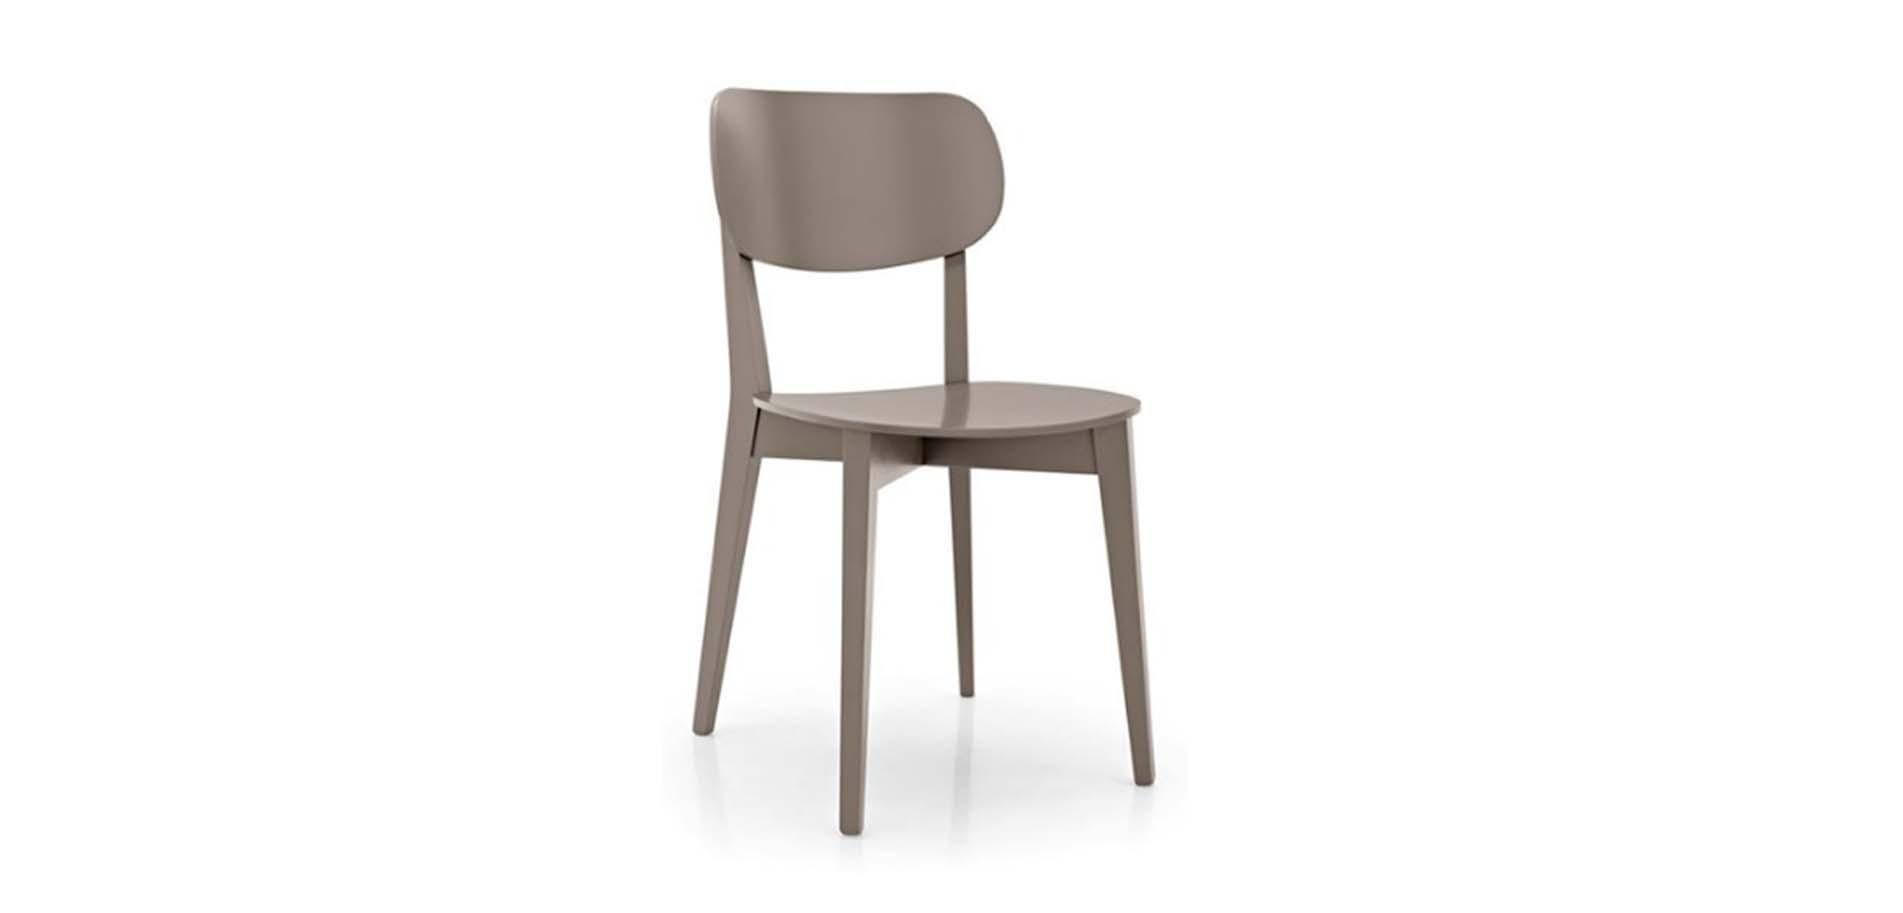 Cool Connubia Calligaris Beste Wahl Ιταλικές καρέκλες